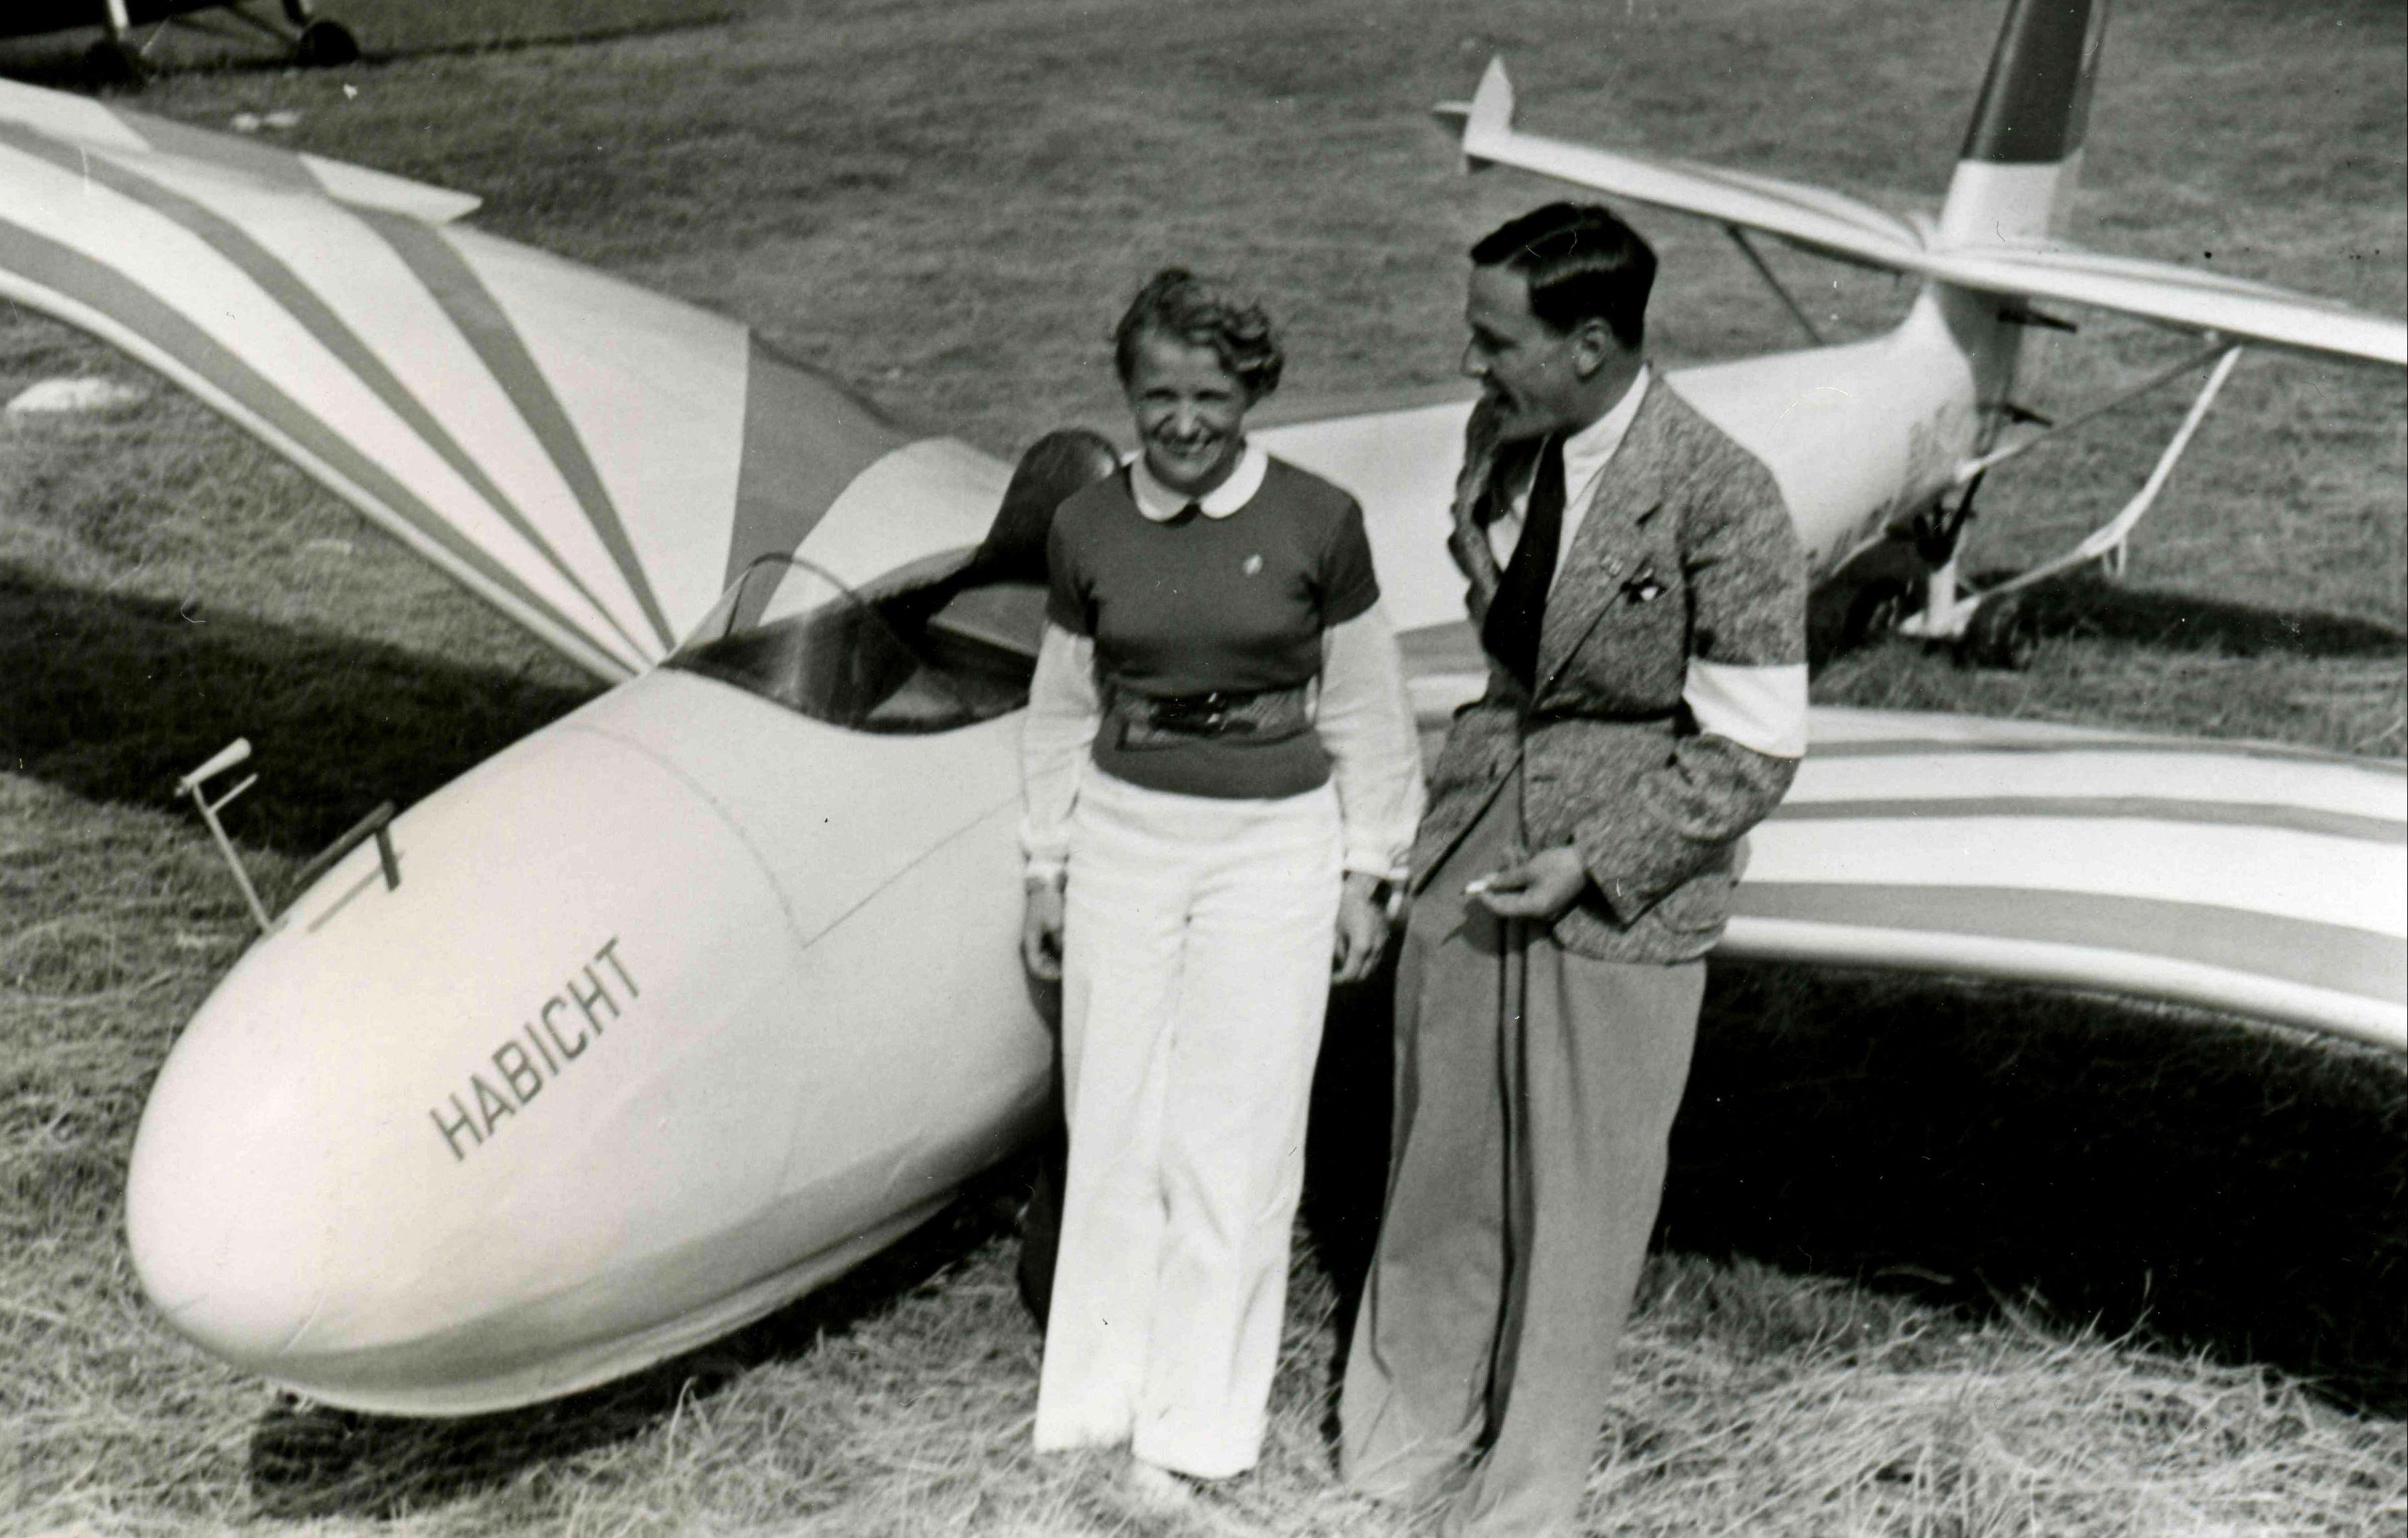 Hanna Reitsch with a DFS Habicht glider during an air show in Kassel-Waldau, Germany, 17 Jul 1938